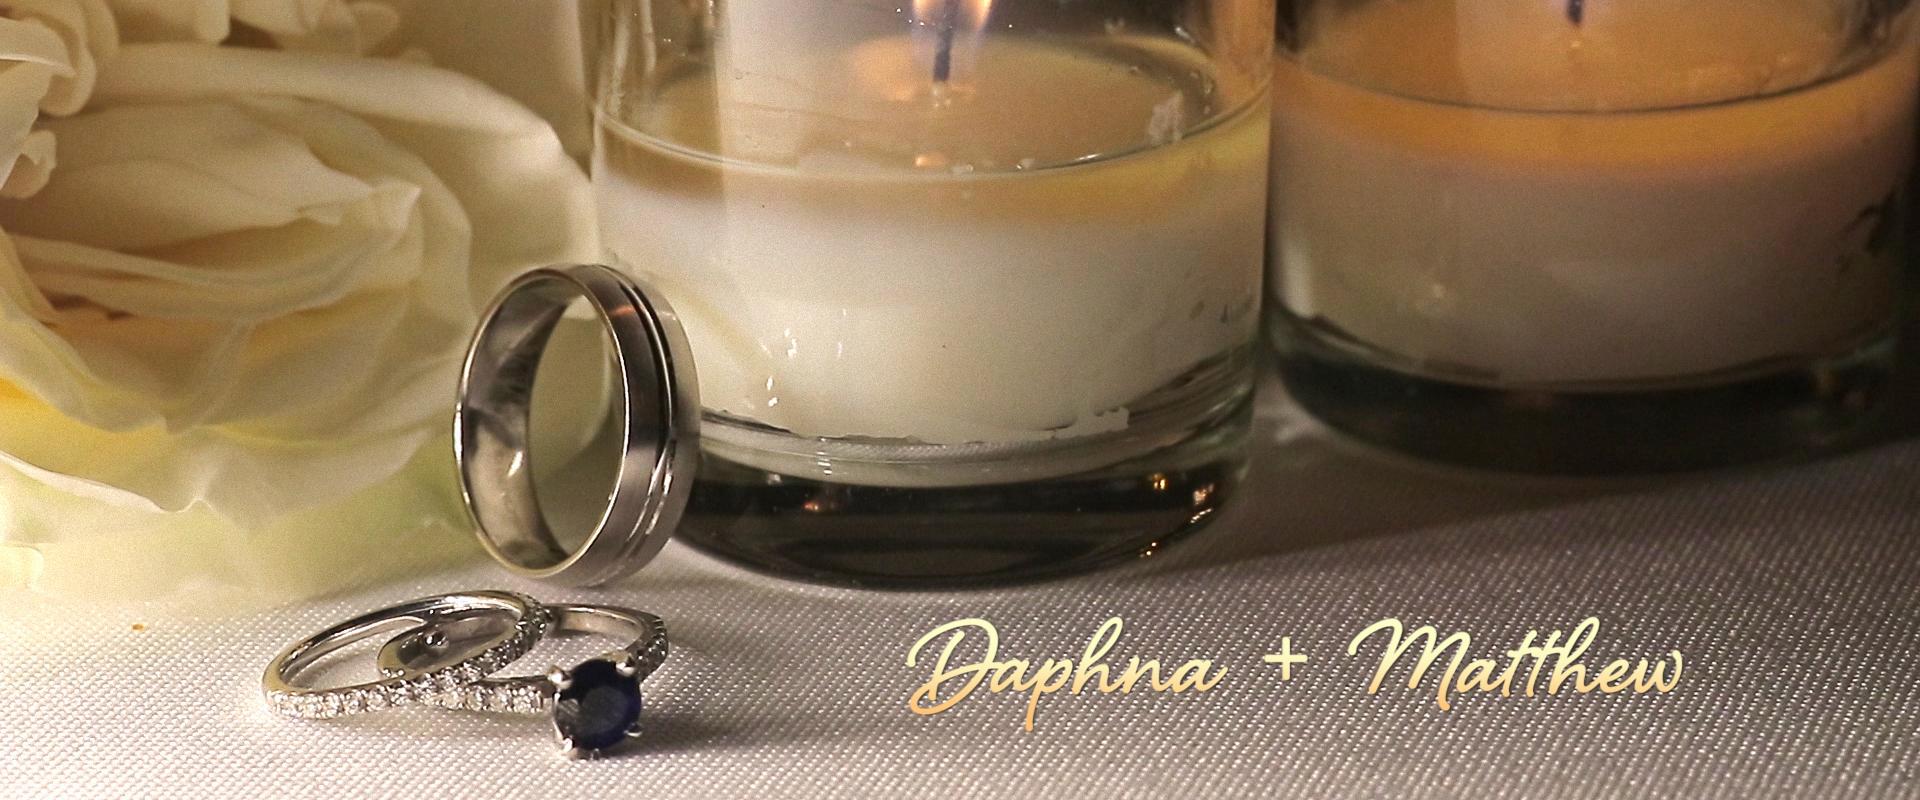 Daphna + Matthew | Miami, Florida | Villa Woodbine